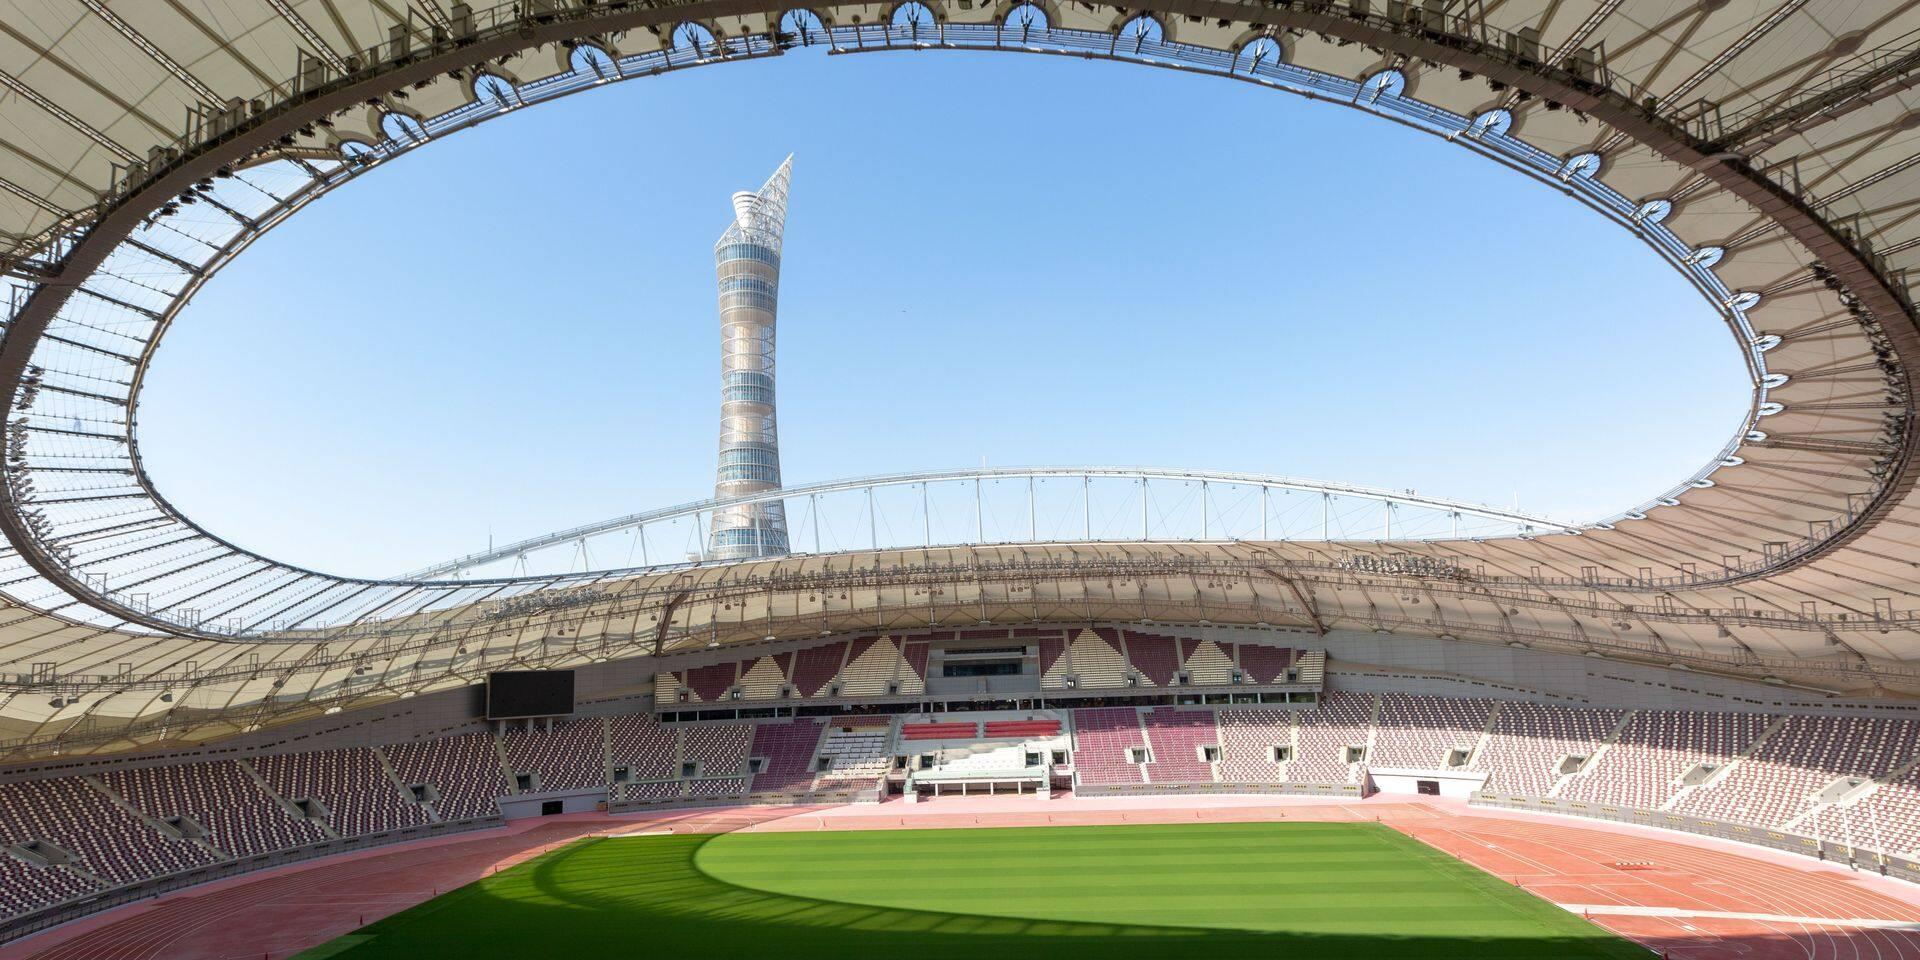 Qatar hosts the 2022 FIFA World Cup